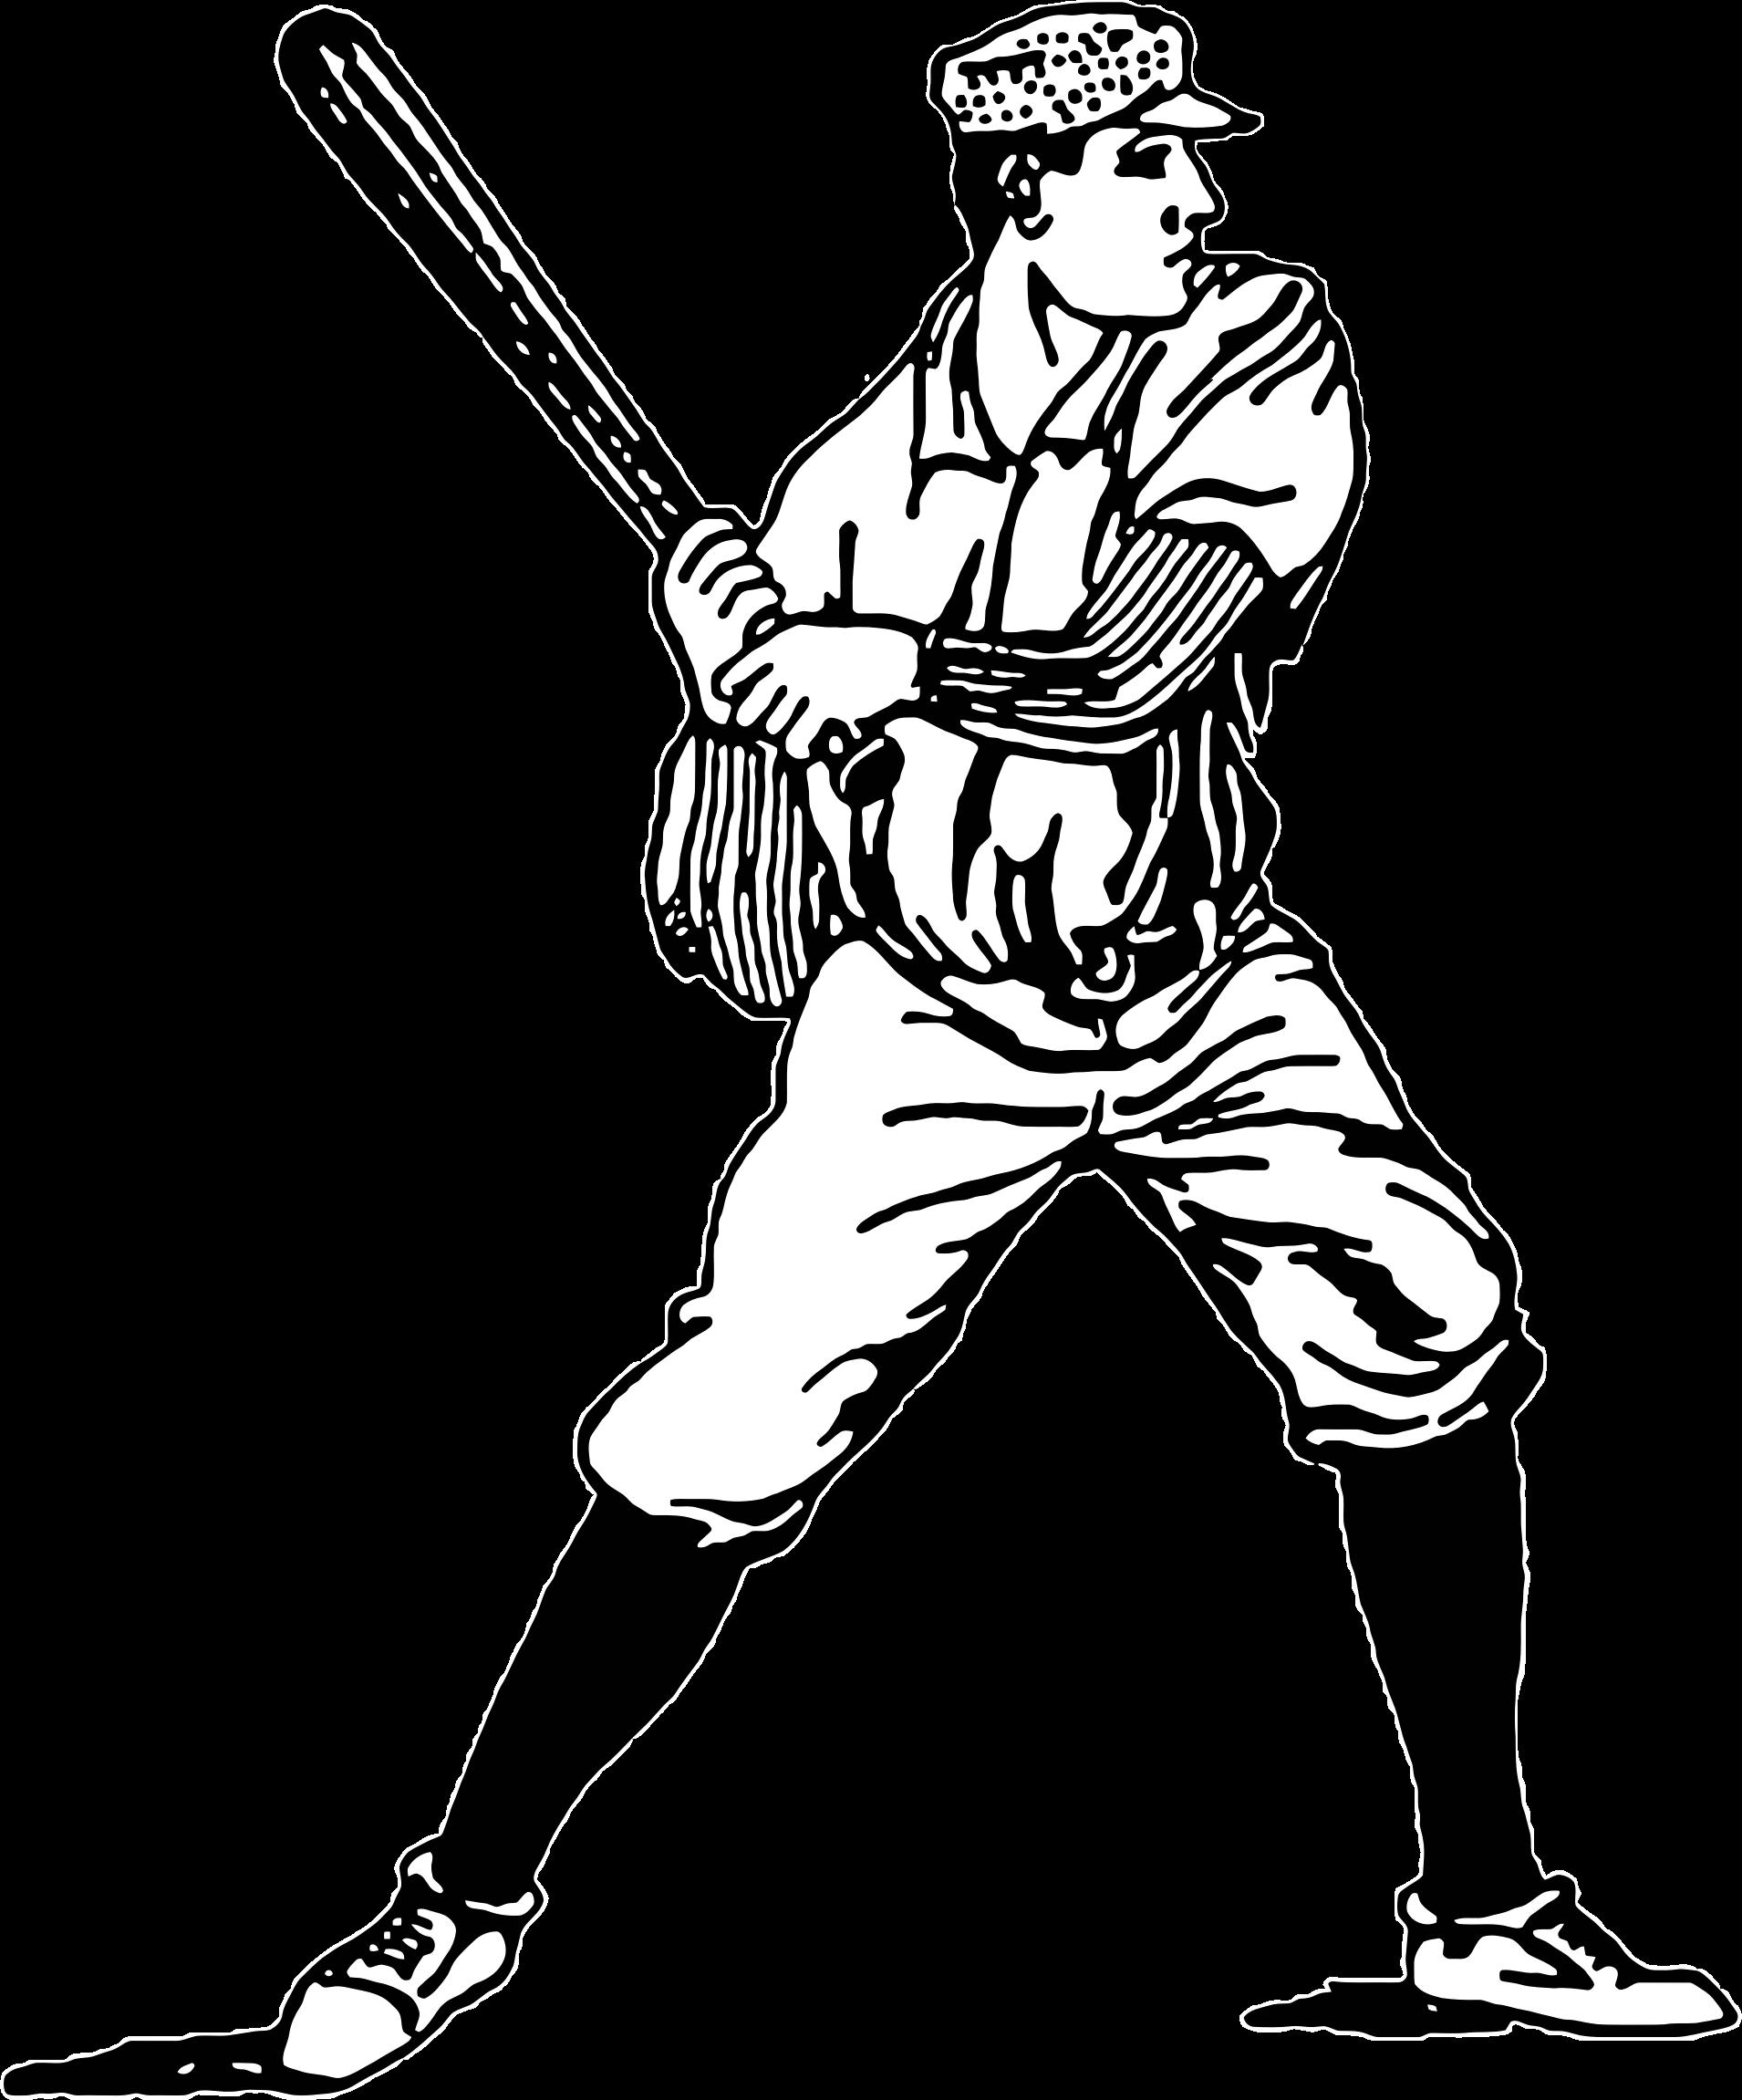 Vintage player illustration big. People clipart baseball